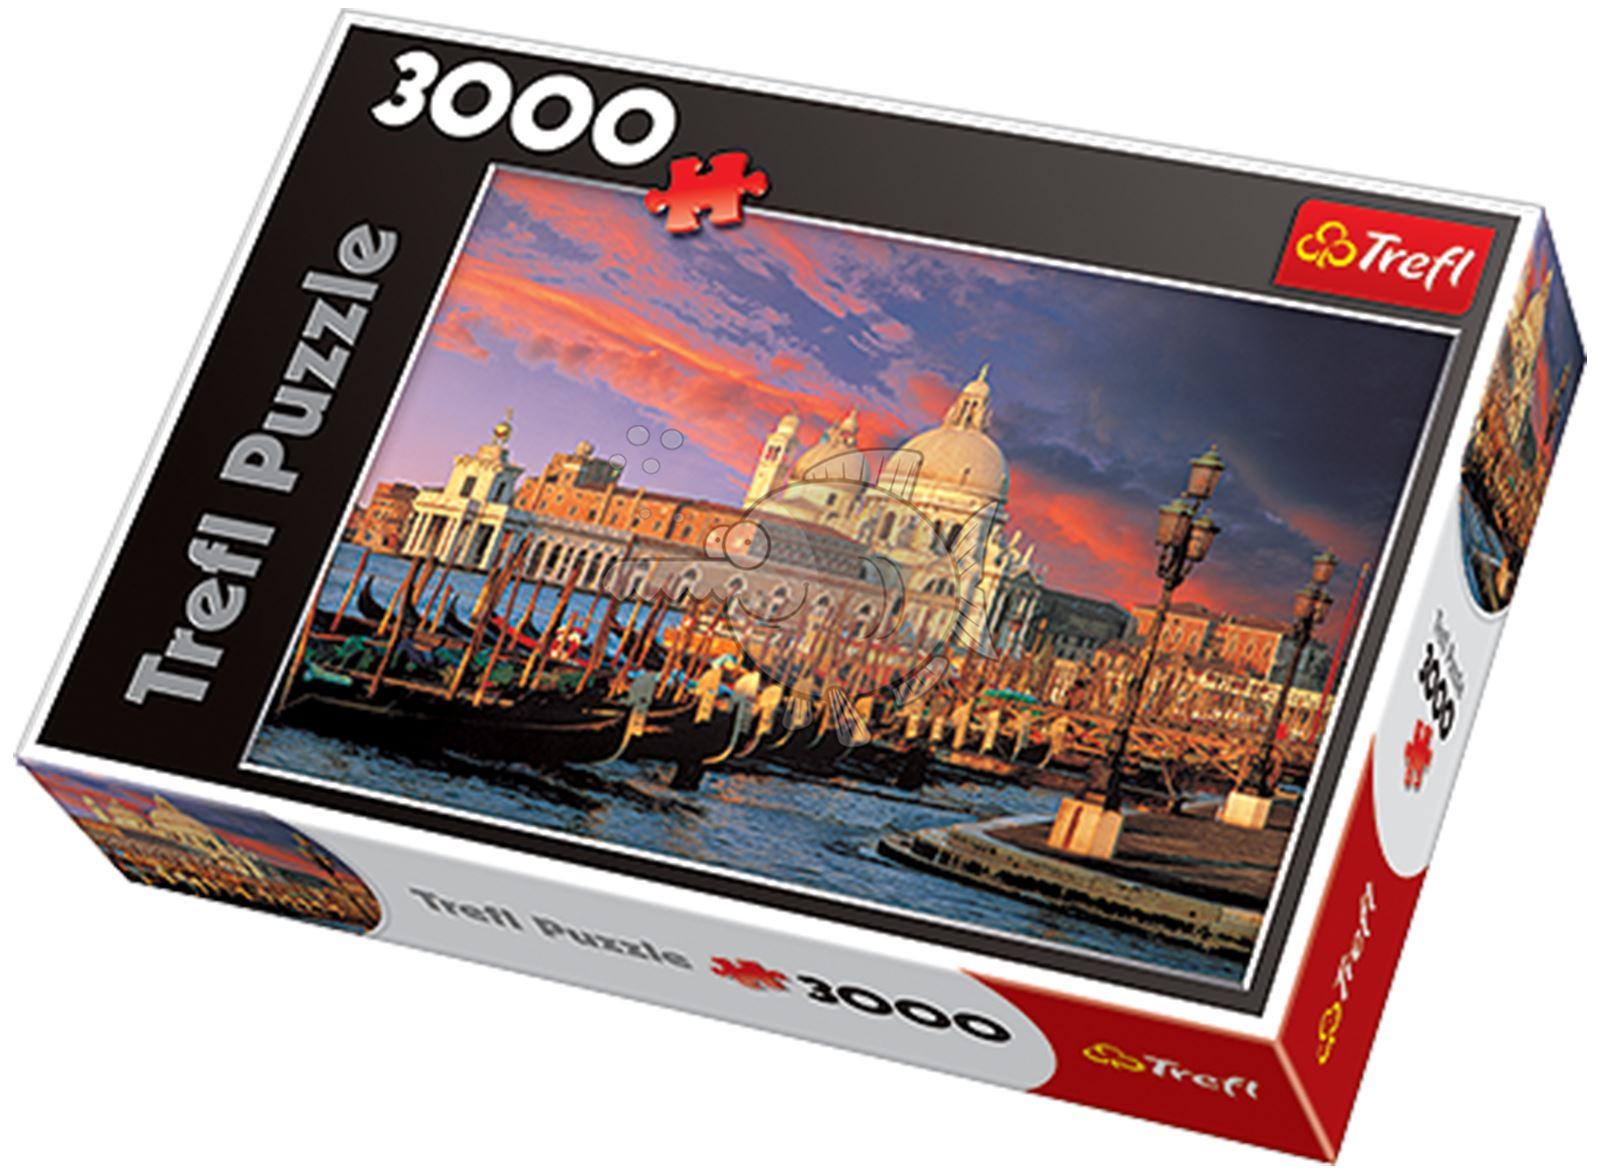 Trefl-300-500-1000-1500-2000-3000-4000-6000-Piece-Jigsaw-Puzzle-Landscapes-City thumbnail 316